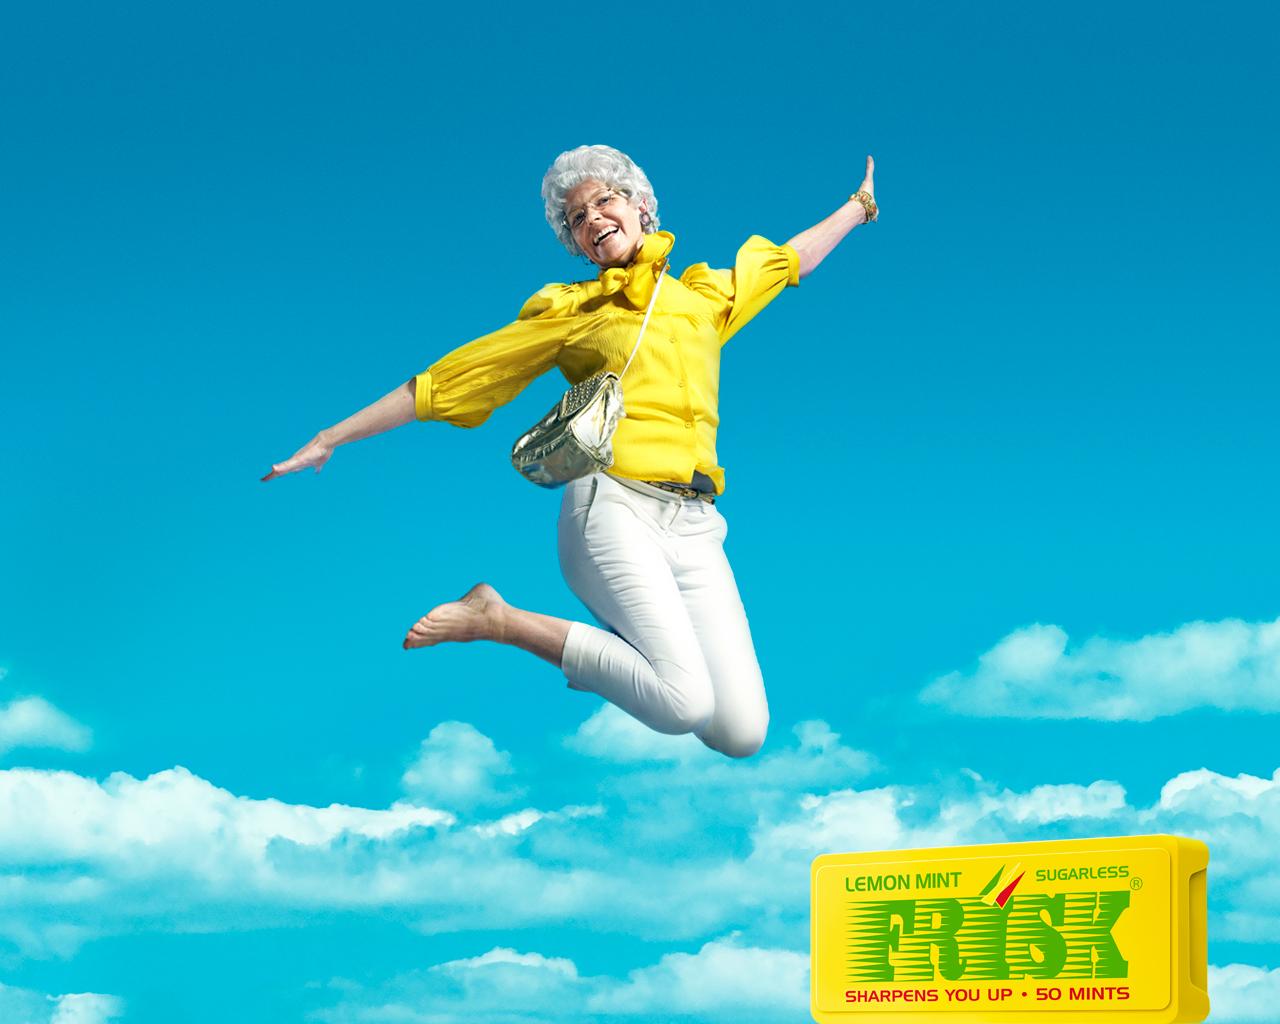 http://www.mediatinker.com/blog/2011/09/05/jumping_grandma_1280.jpg